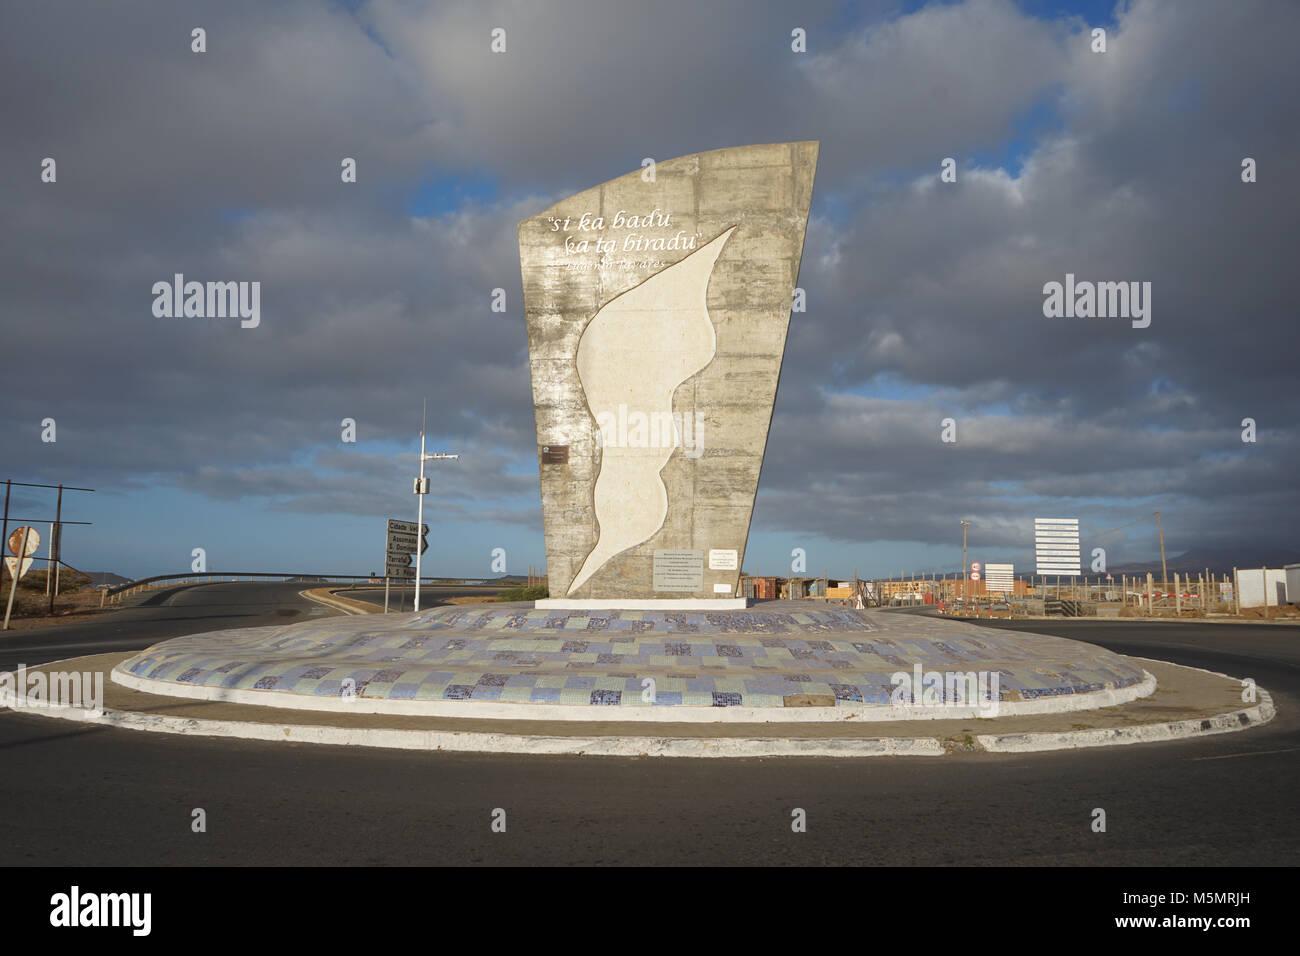 Monument to the Emigrants, Praia International Airport, Santiago Island, Cape Verde - Stock Image